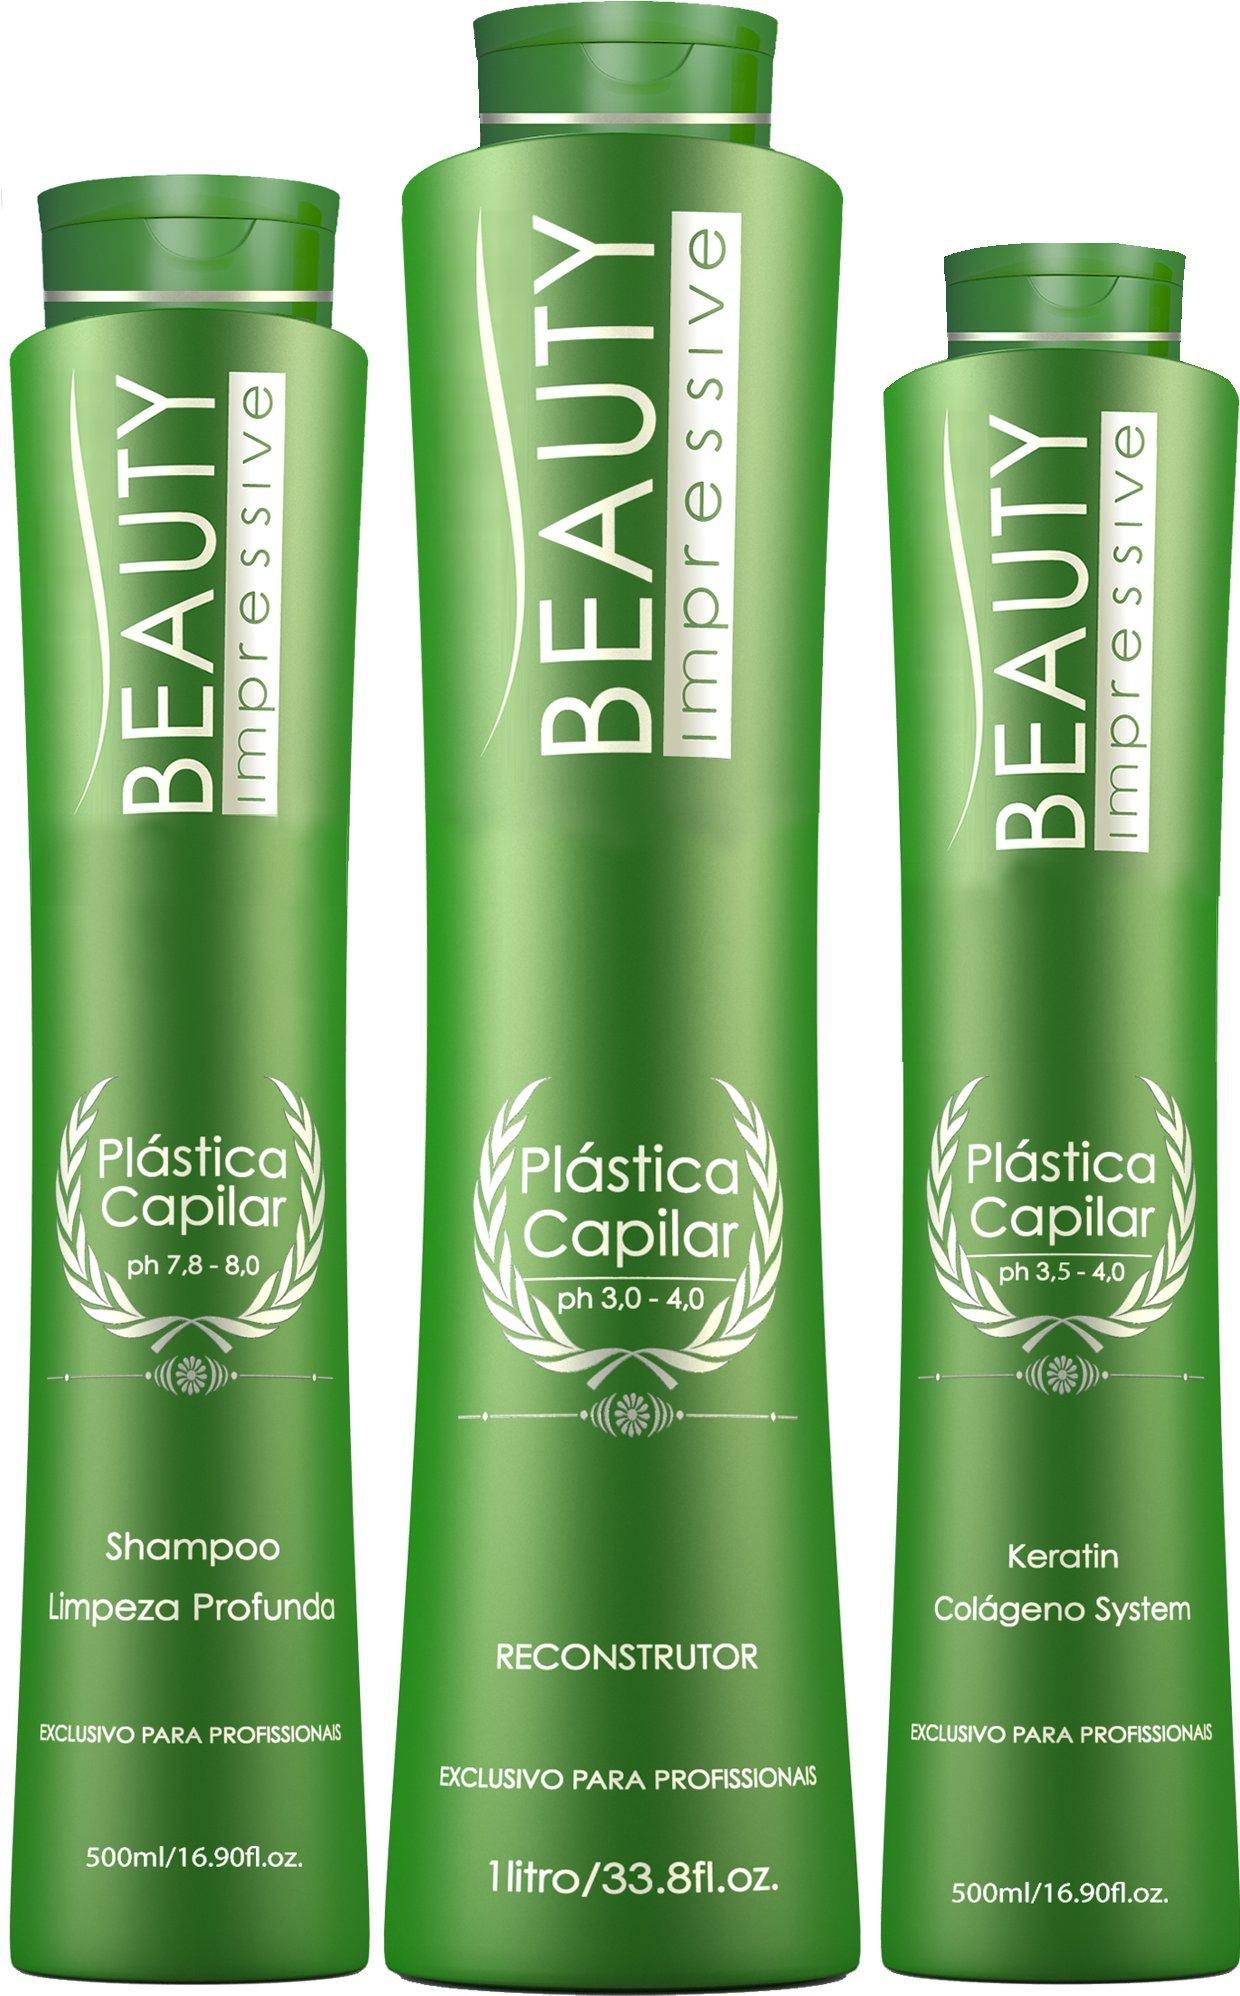 Brazilian Hair Botox Keratin Maintenance - Plastica Capilar by Beauty Progress - Set of 3 - Shampoo (500ML) Reconstructor (1L) Keratin (500ML) 10+ Applications